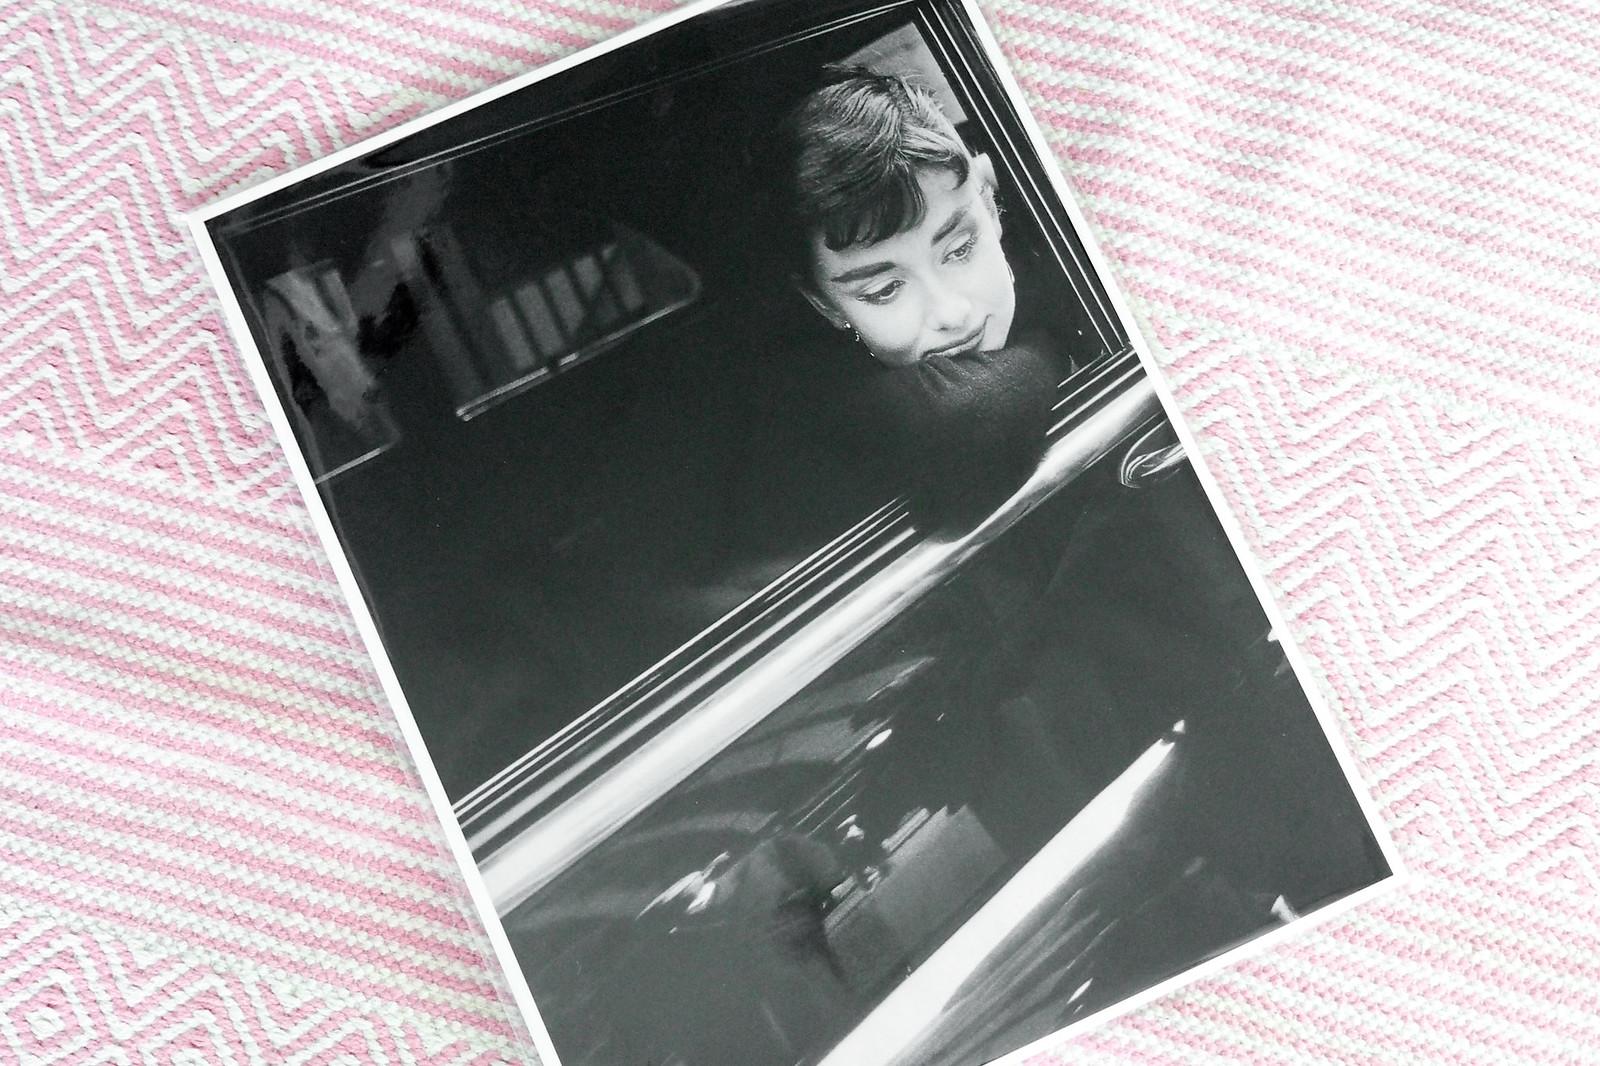 mustavalkoinen Audrey Hepburn juliste